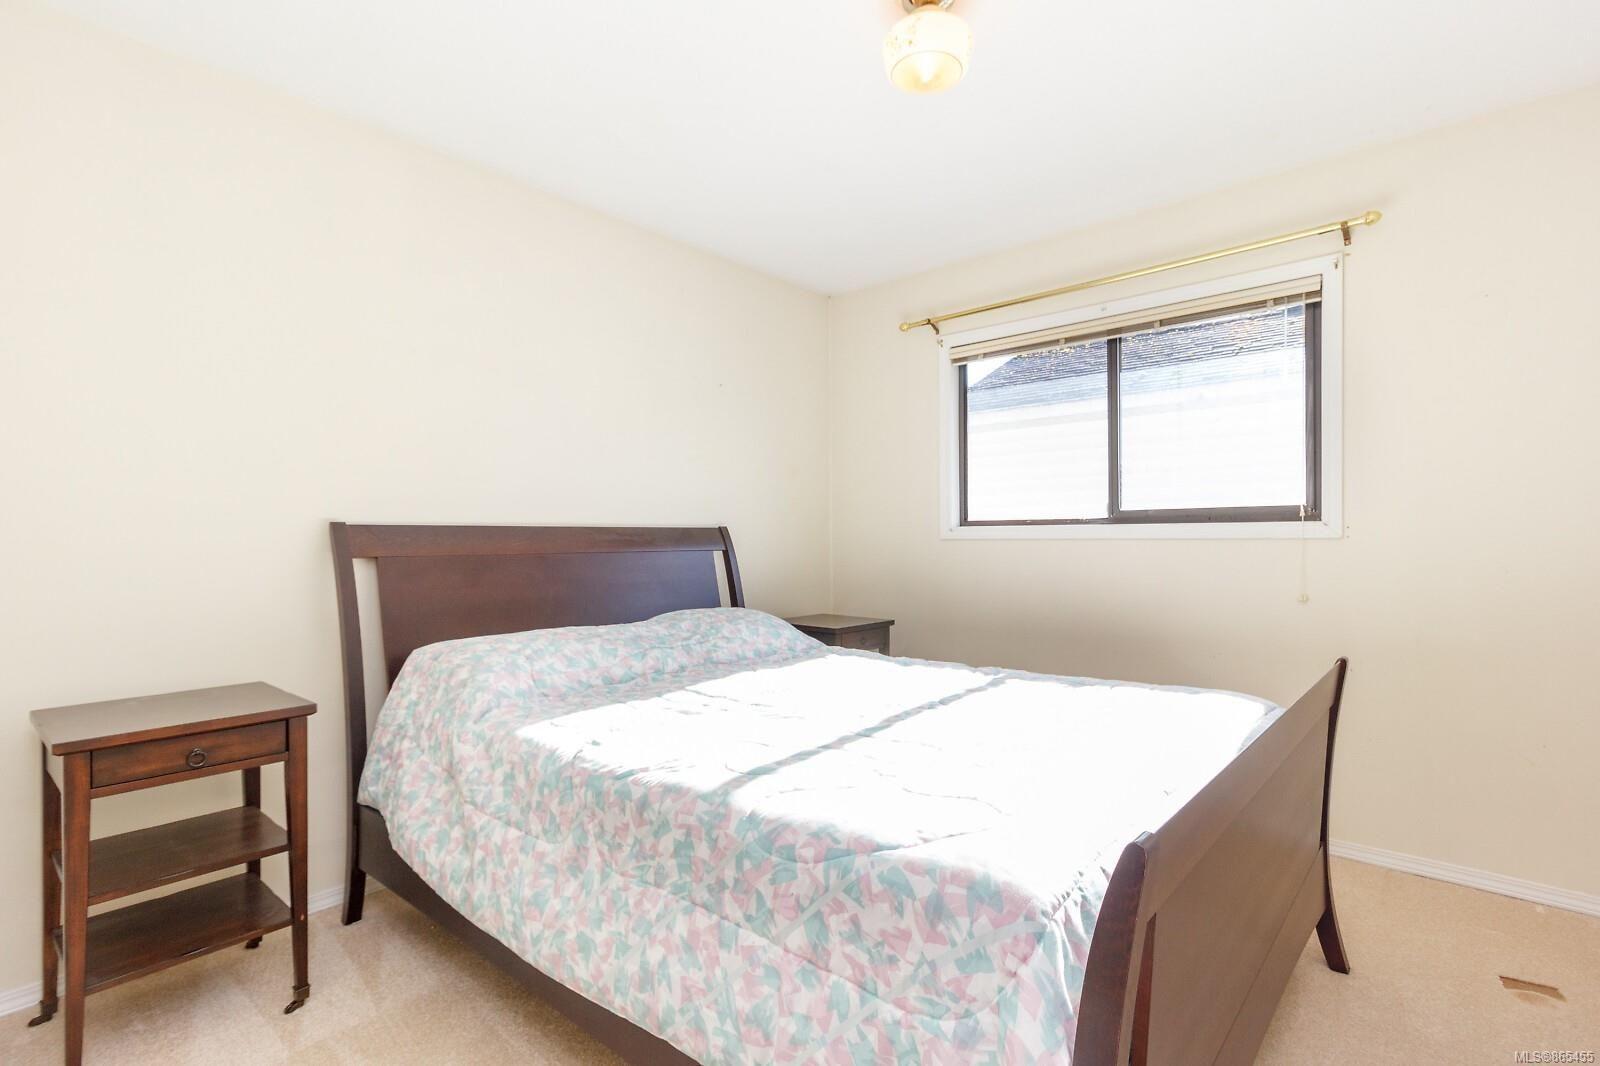 Photo 19: Photos: 399 Beech Ave in : Du East Duncan House for sale (Duncan)  : MLS®# 865455